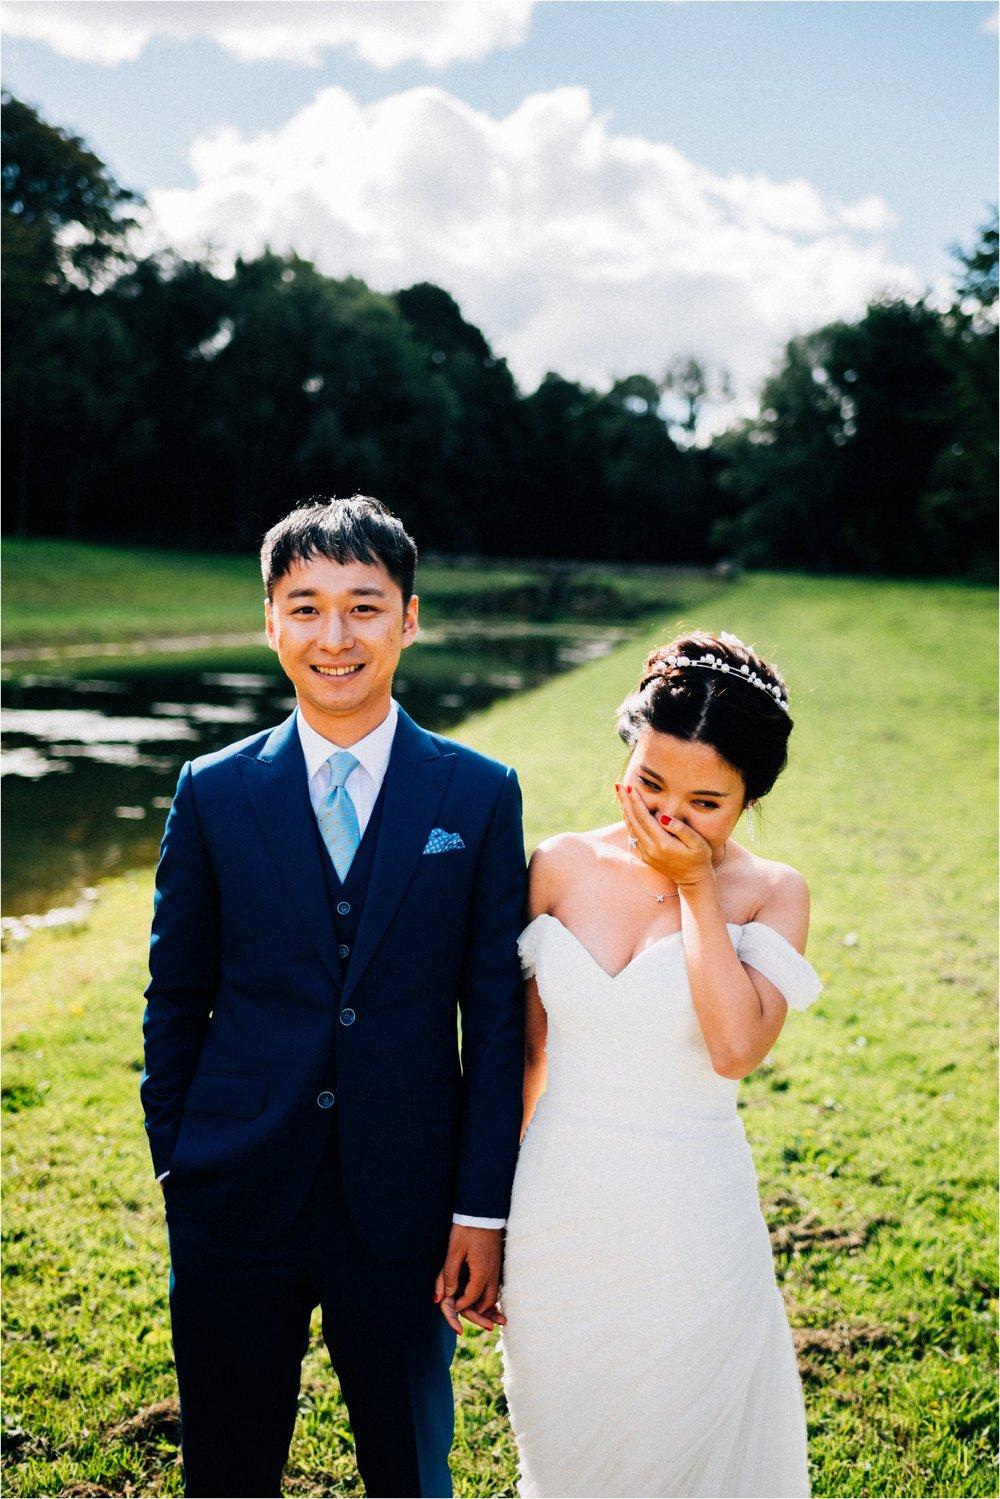 York city elopement wedding photographer_0190.jpg